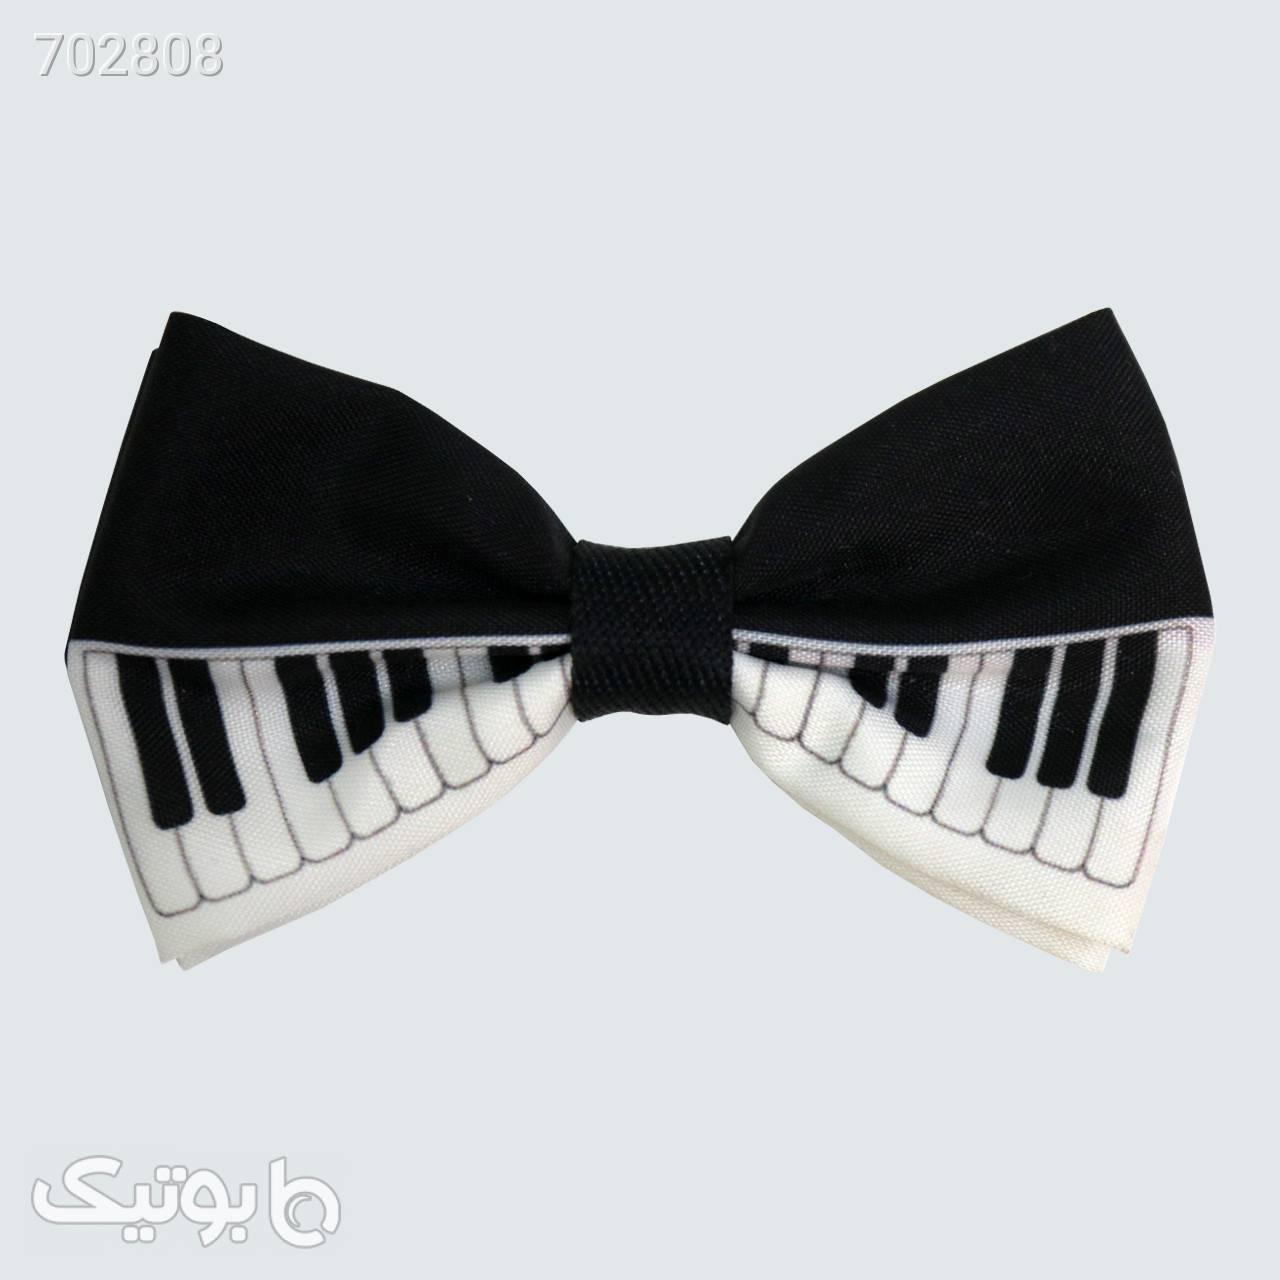 پاپیون مدل پیانو کد 115 مشکی كراوات و پاپيون